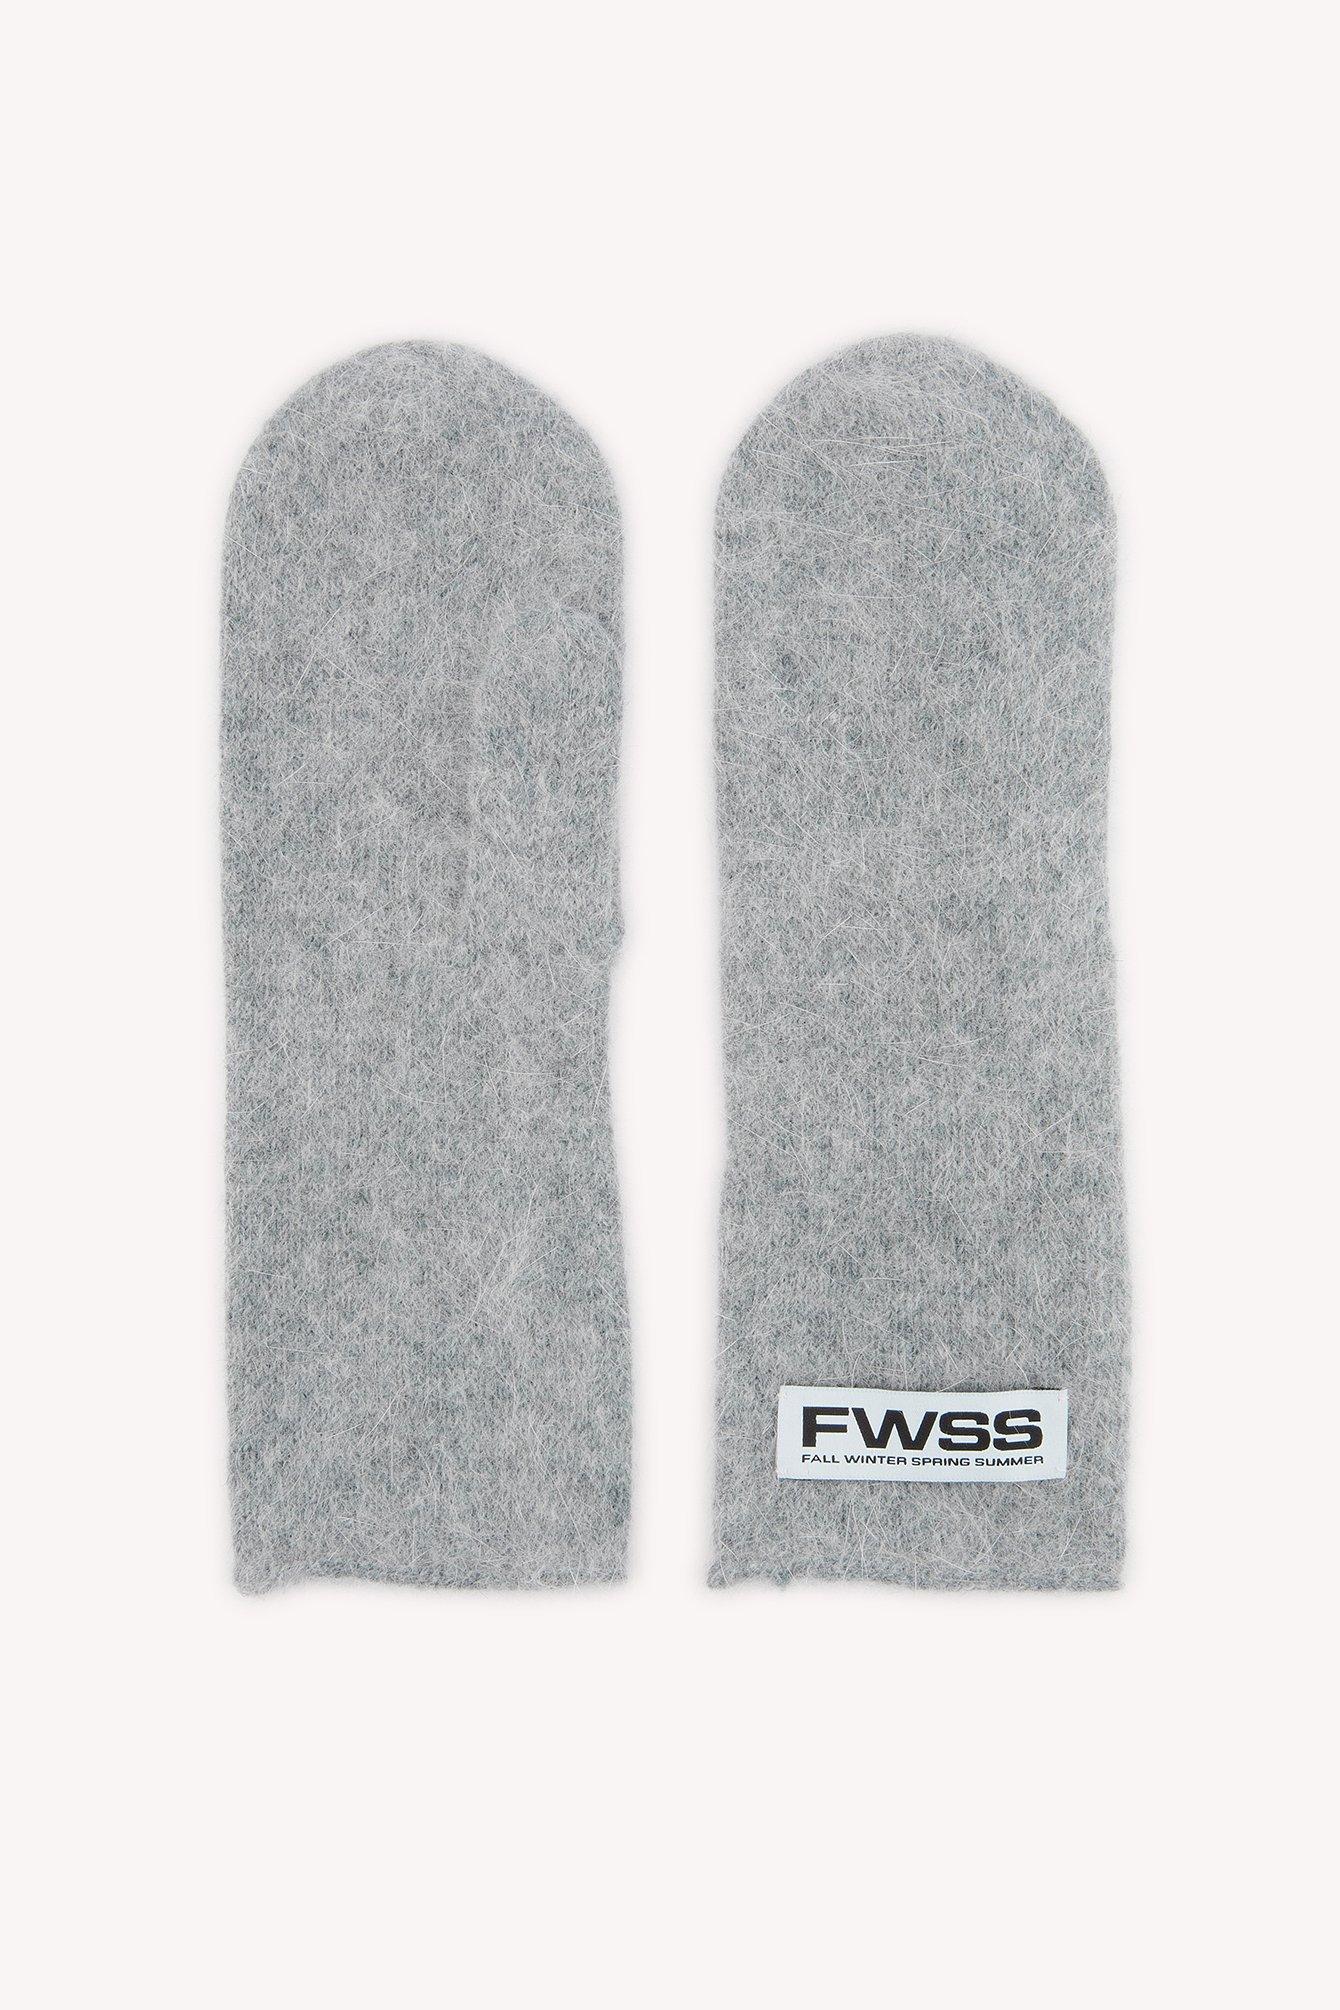 FWSS Talk About Mittens Grey